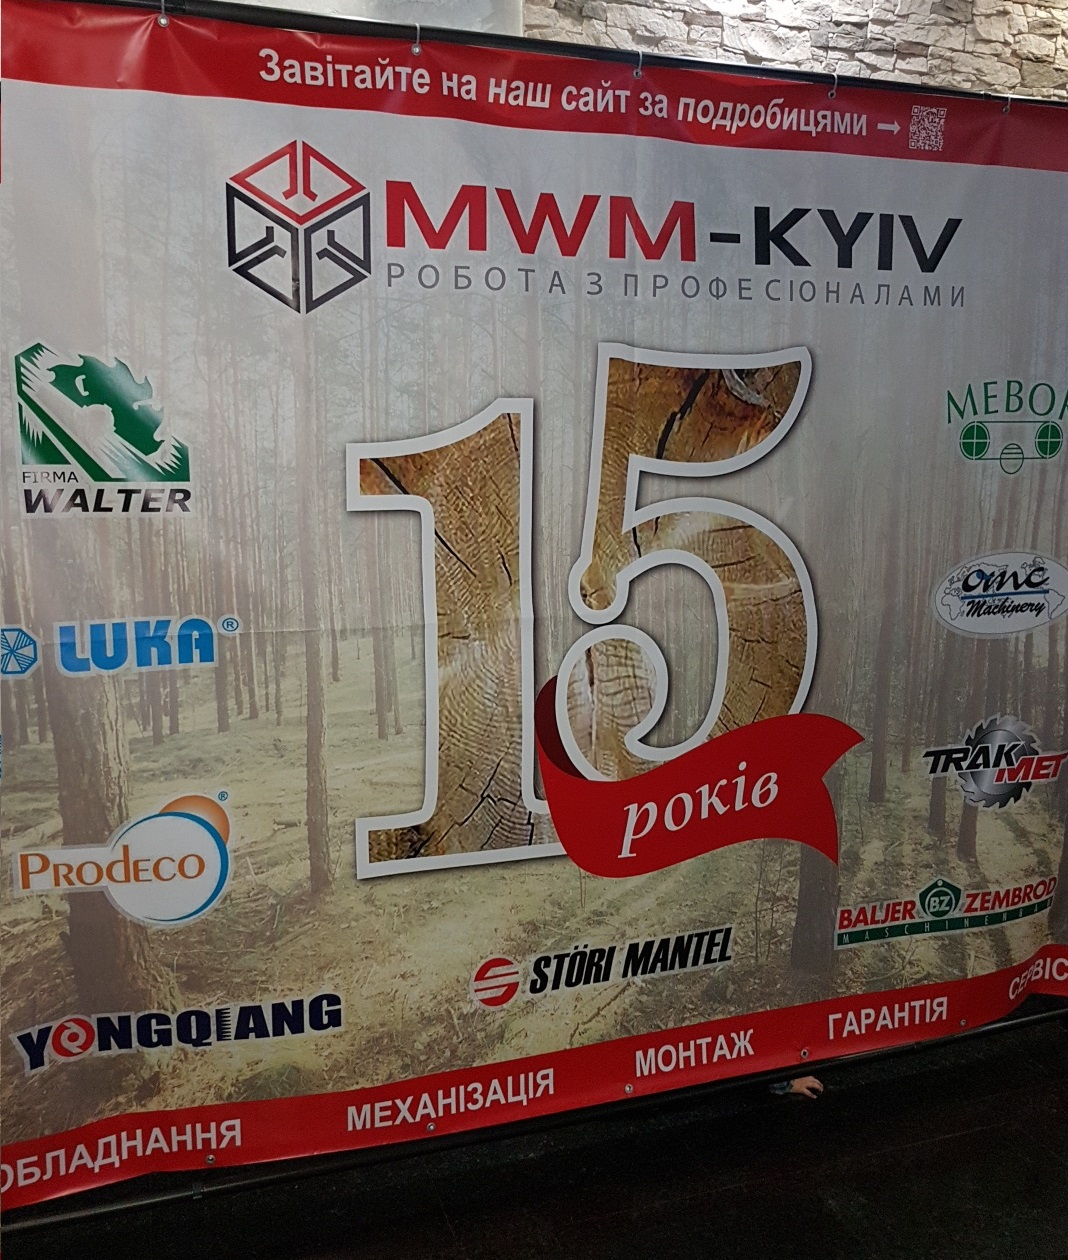 МВМ-Киев 15 -:)